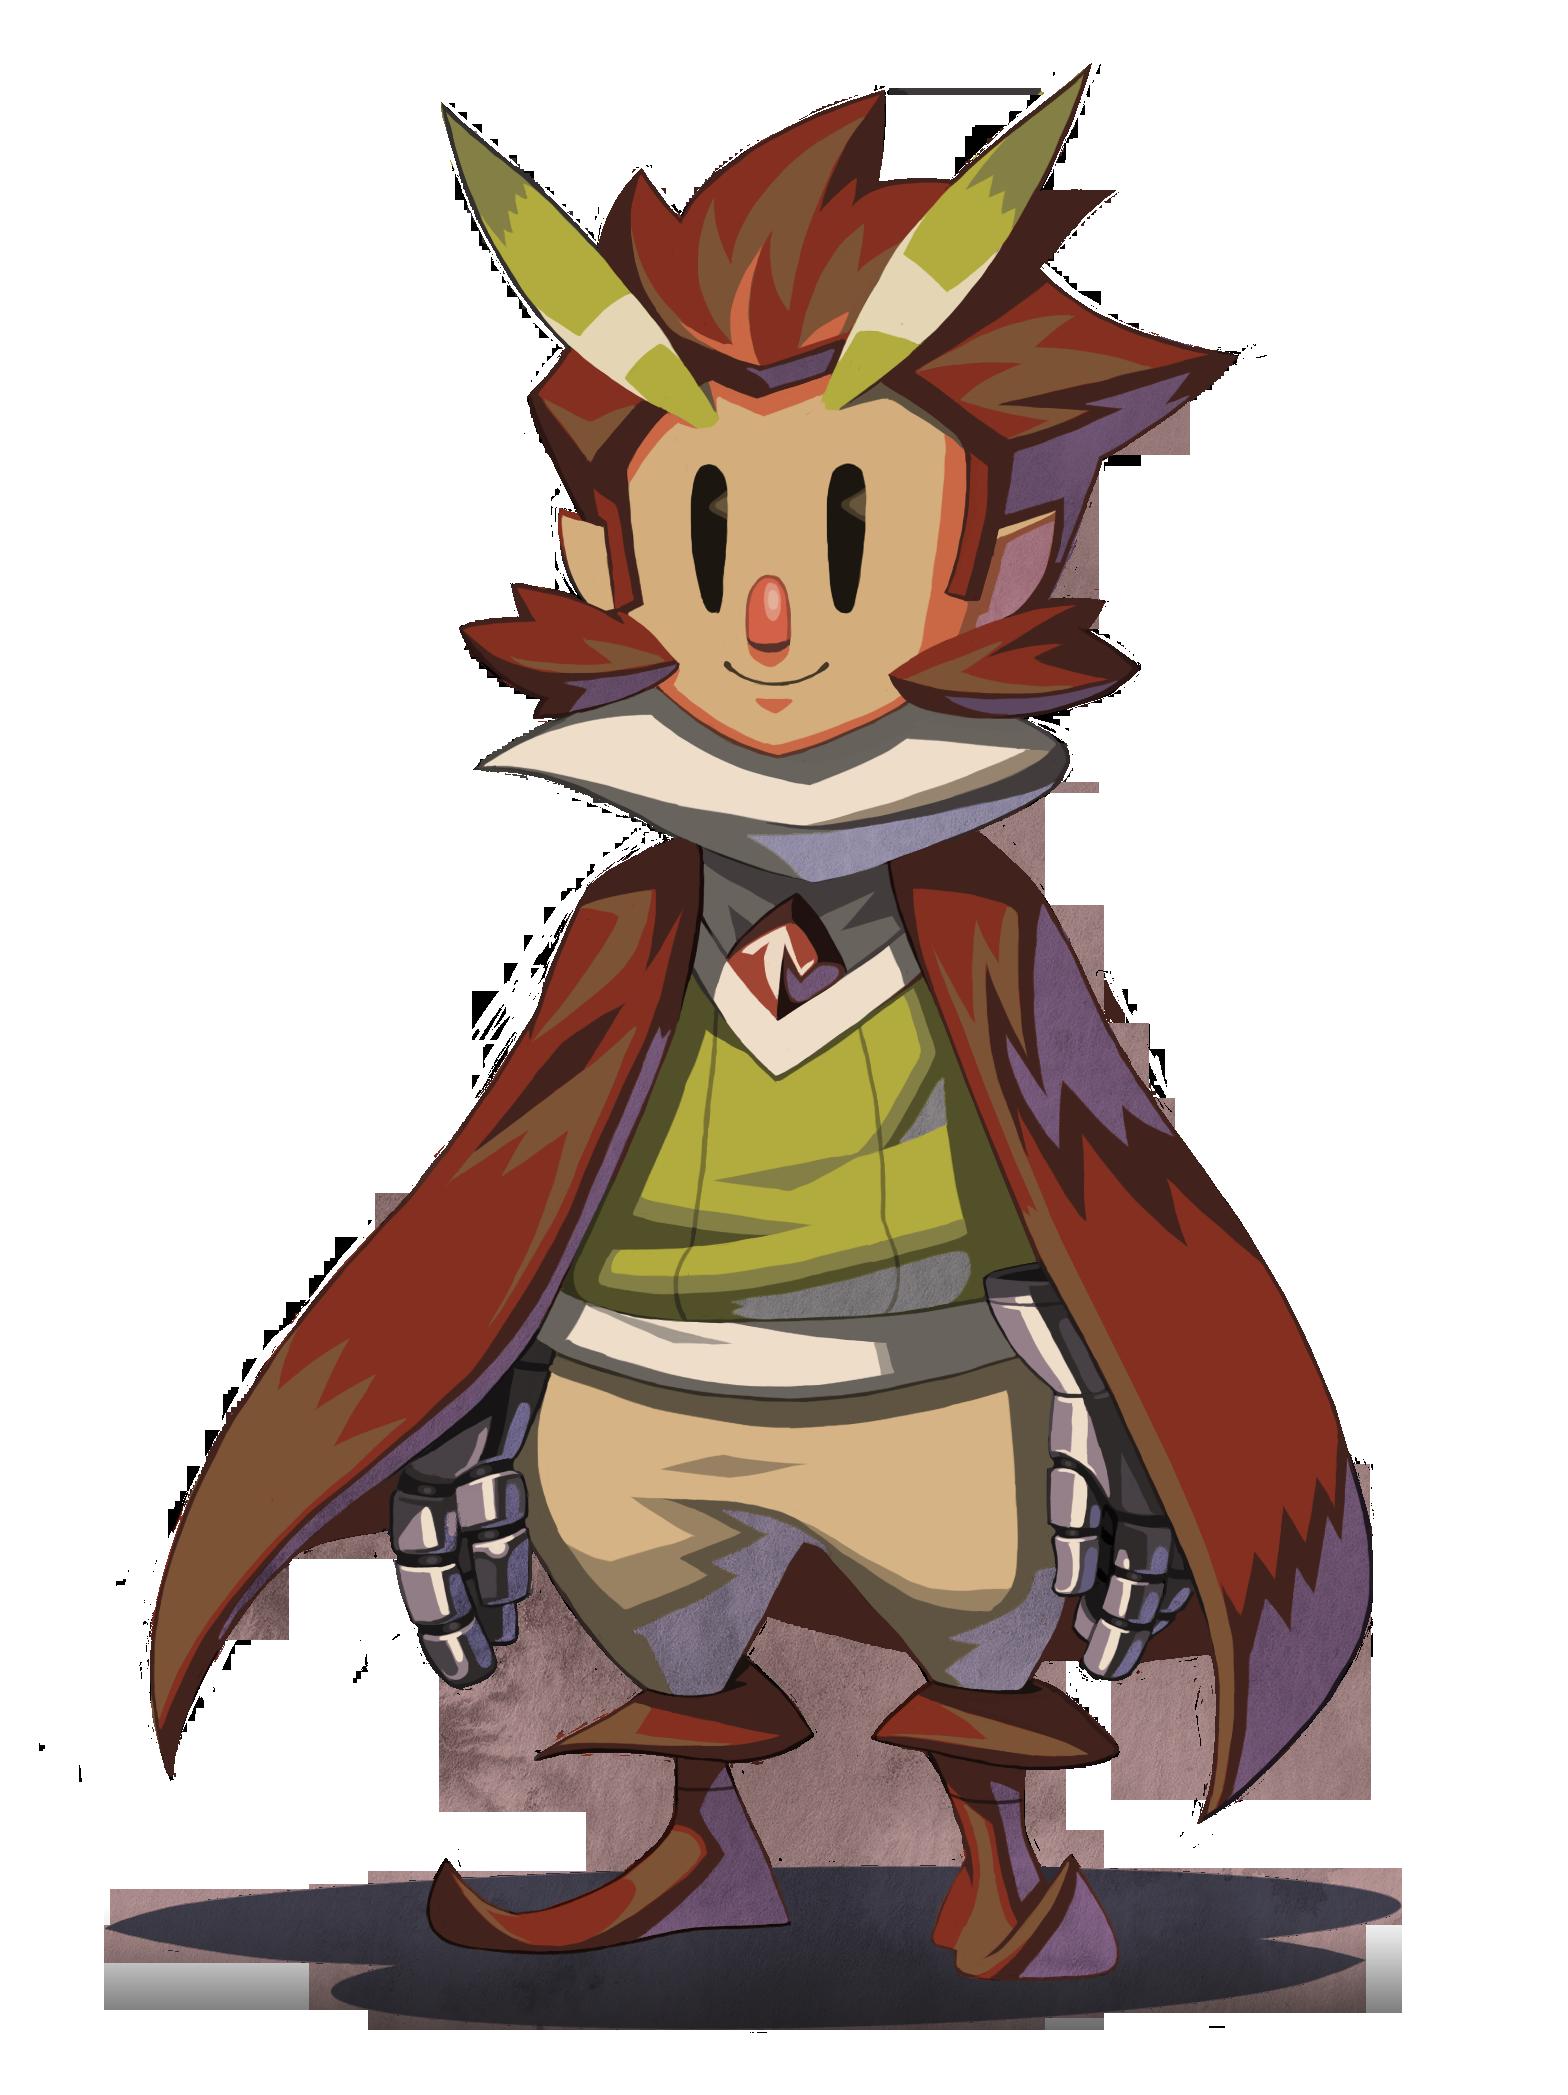 Nervous clipart nervous boy. Otus owlboy wiki fandom